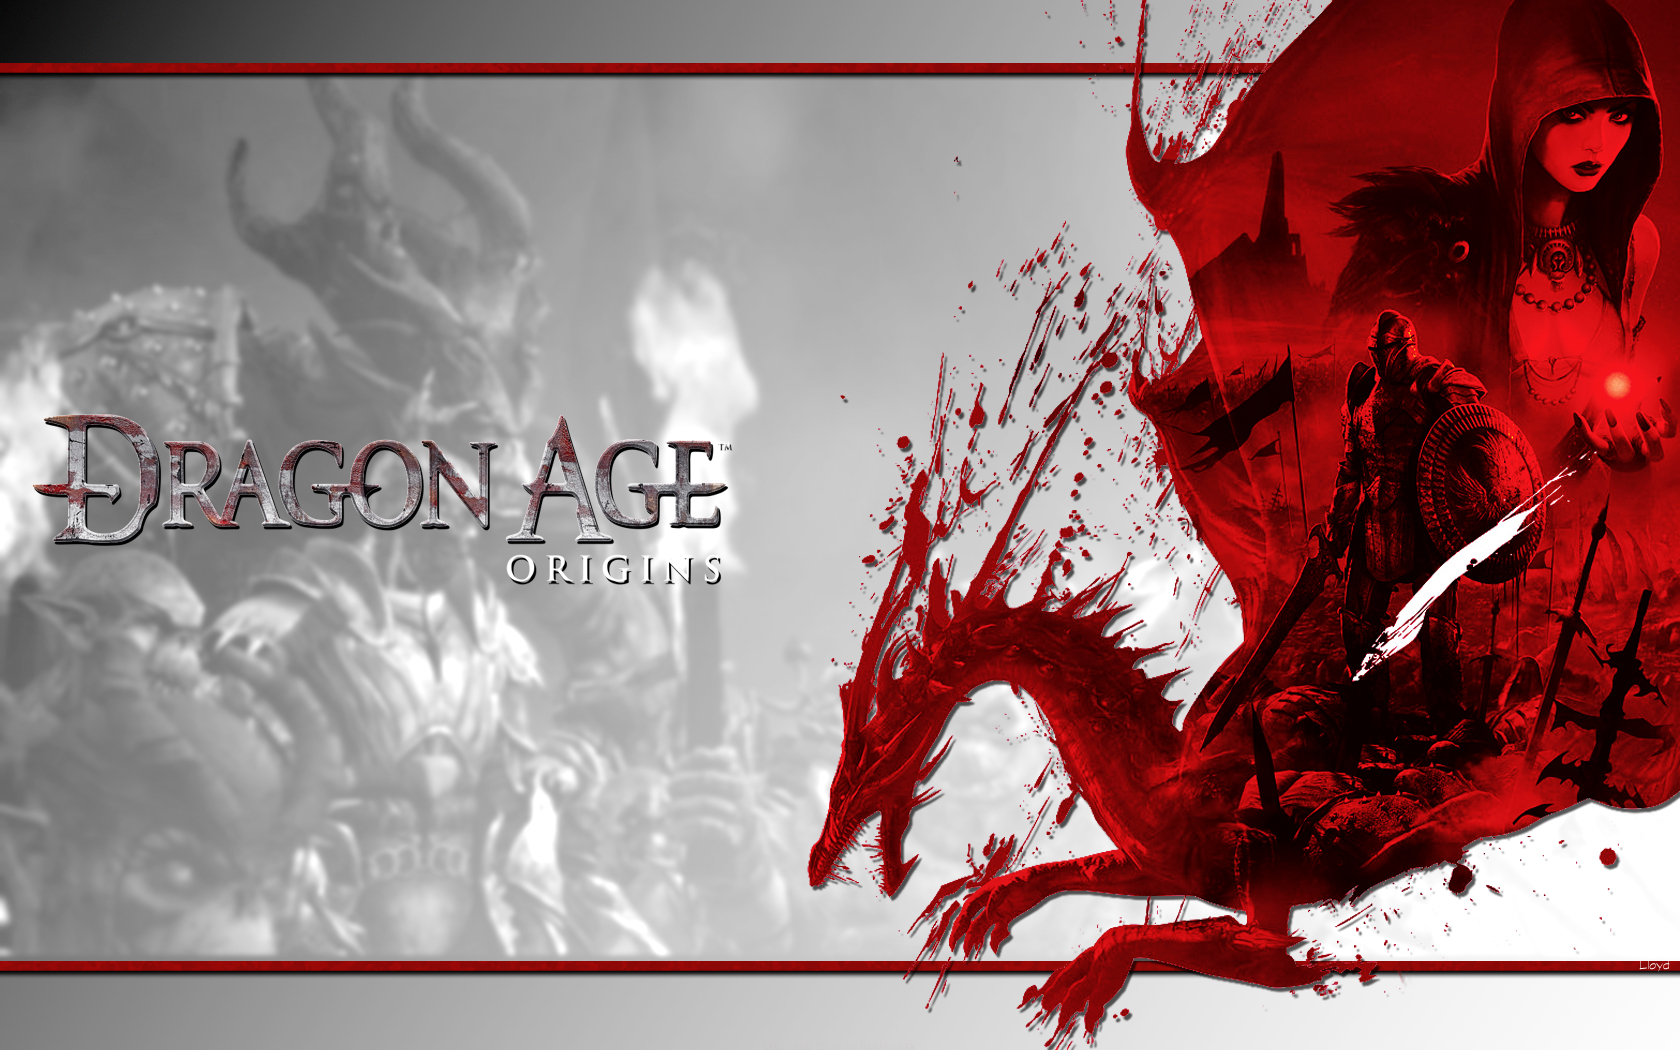 Dragon Age: Origins wp by igotgame1075